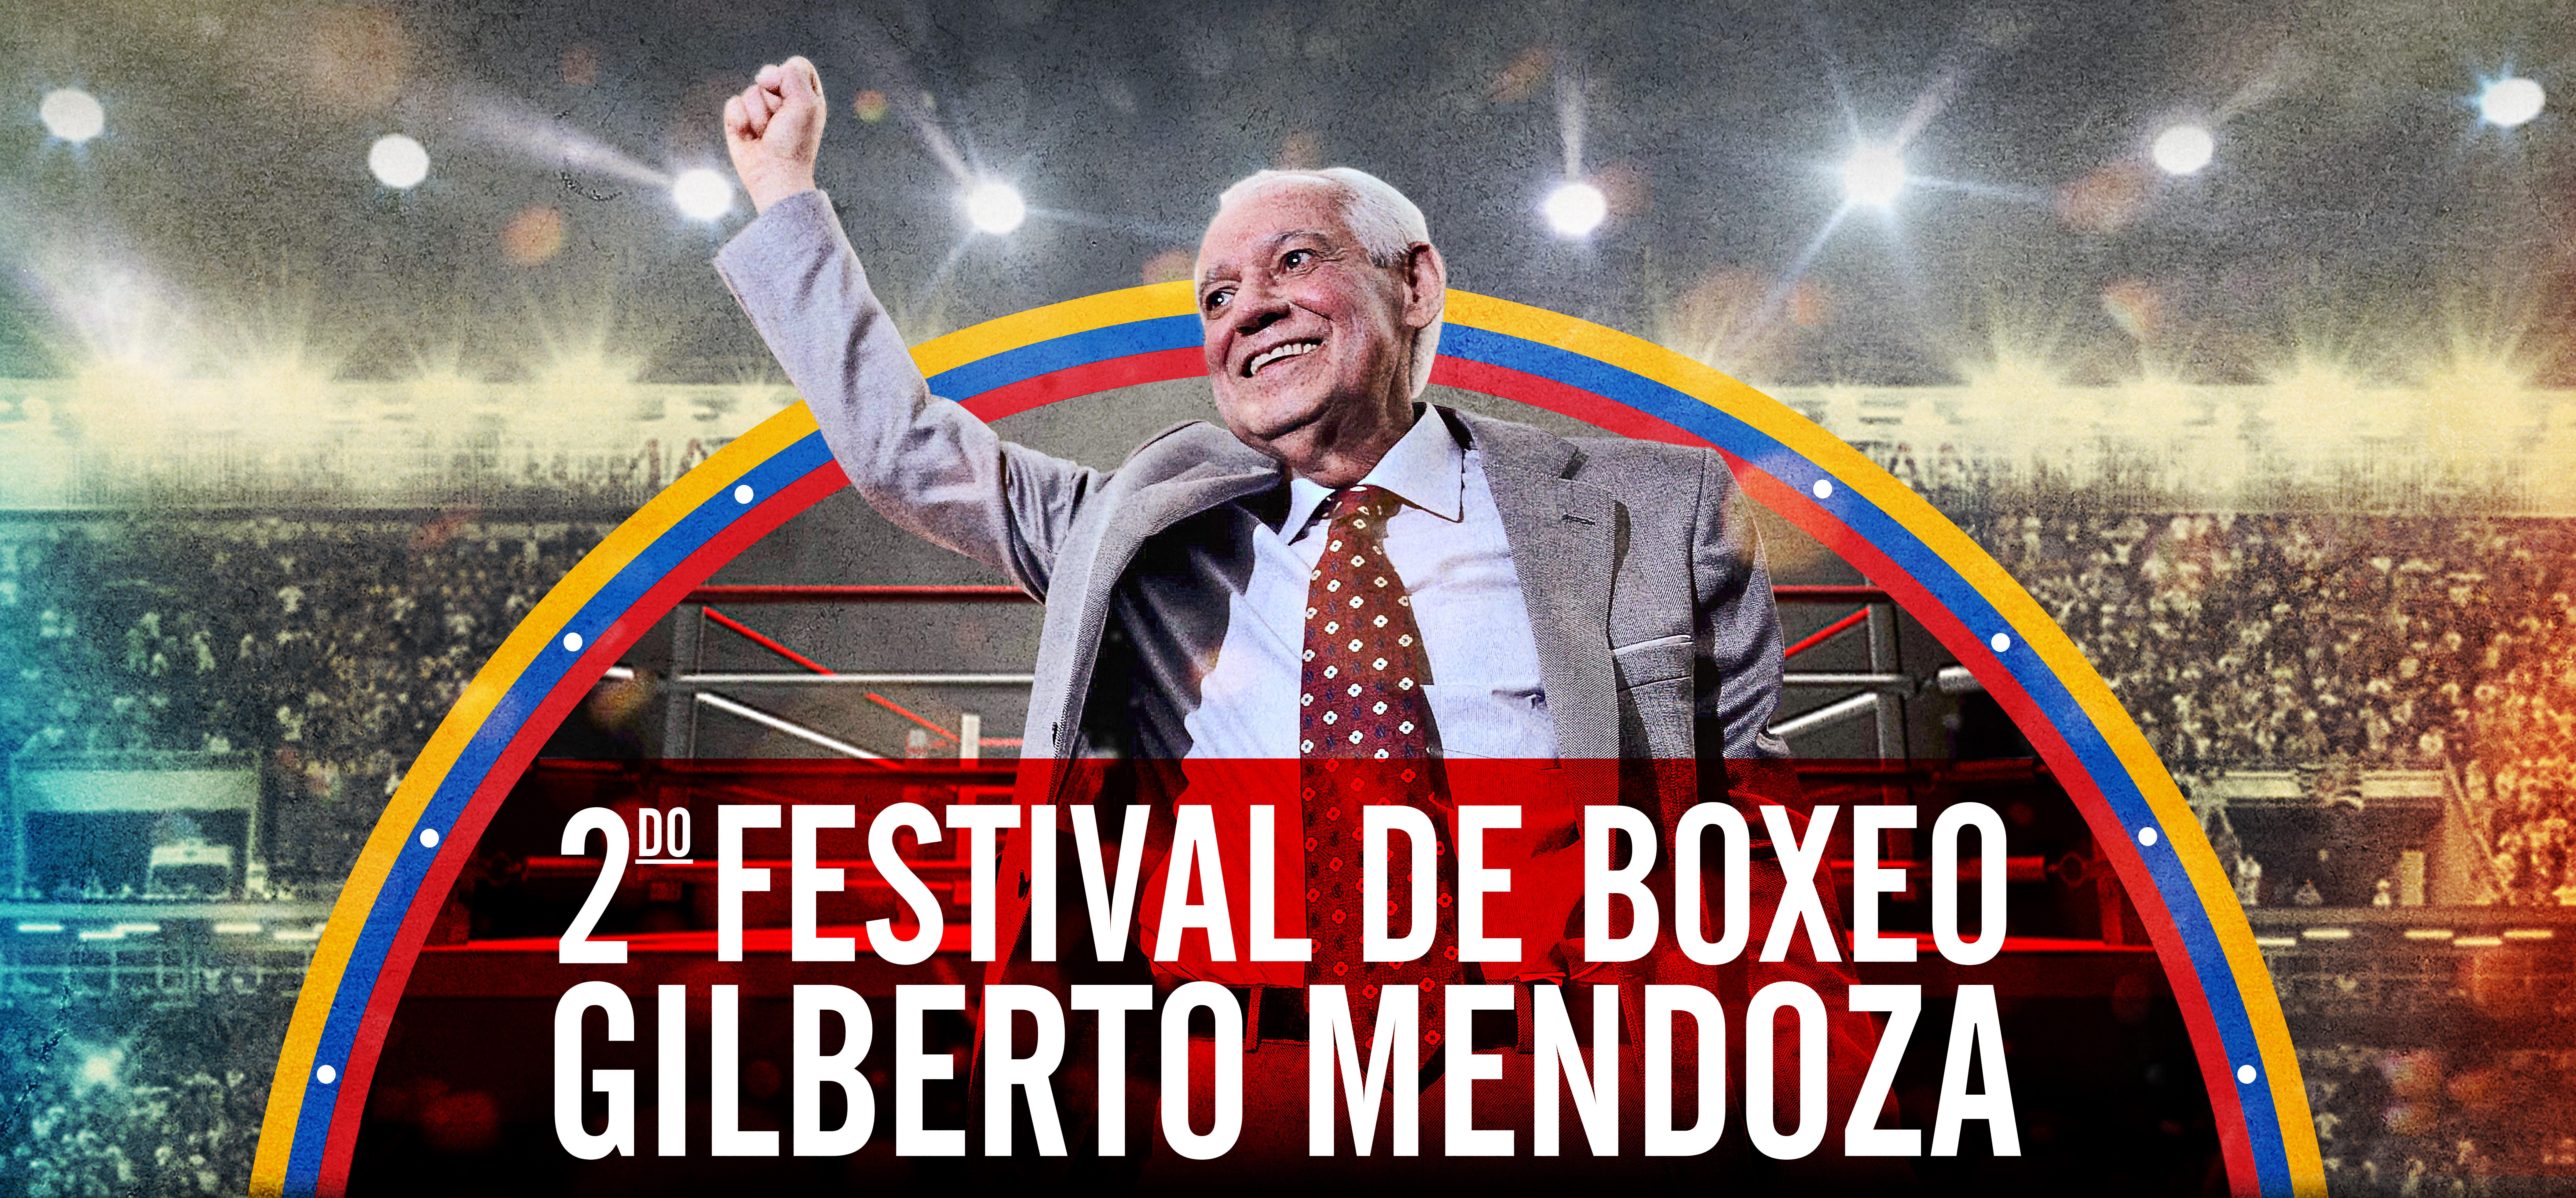 Segundo Festival de boxeo Gilberto Mendoza se desarrolla con éxito